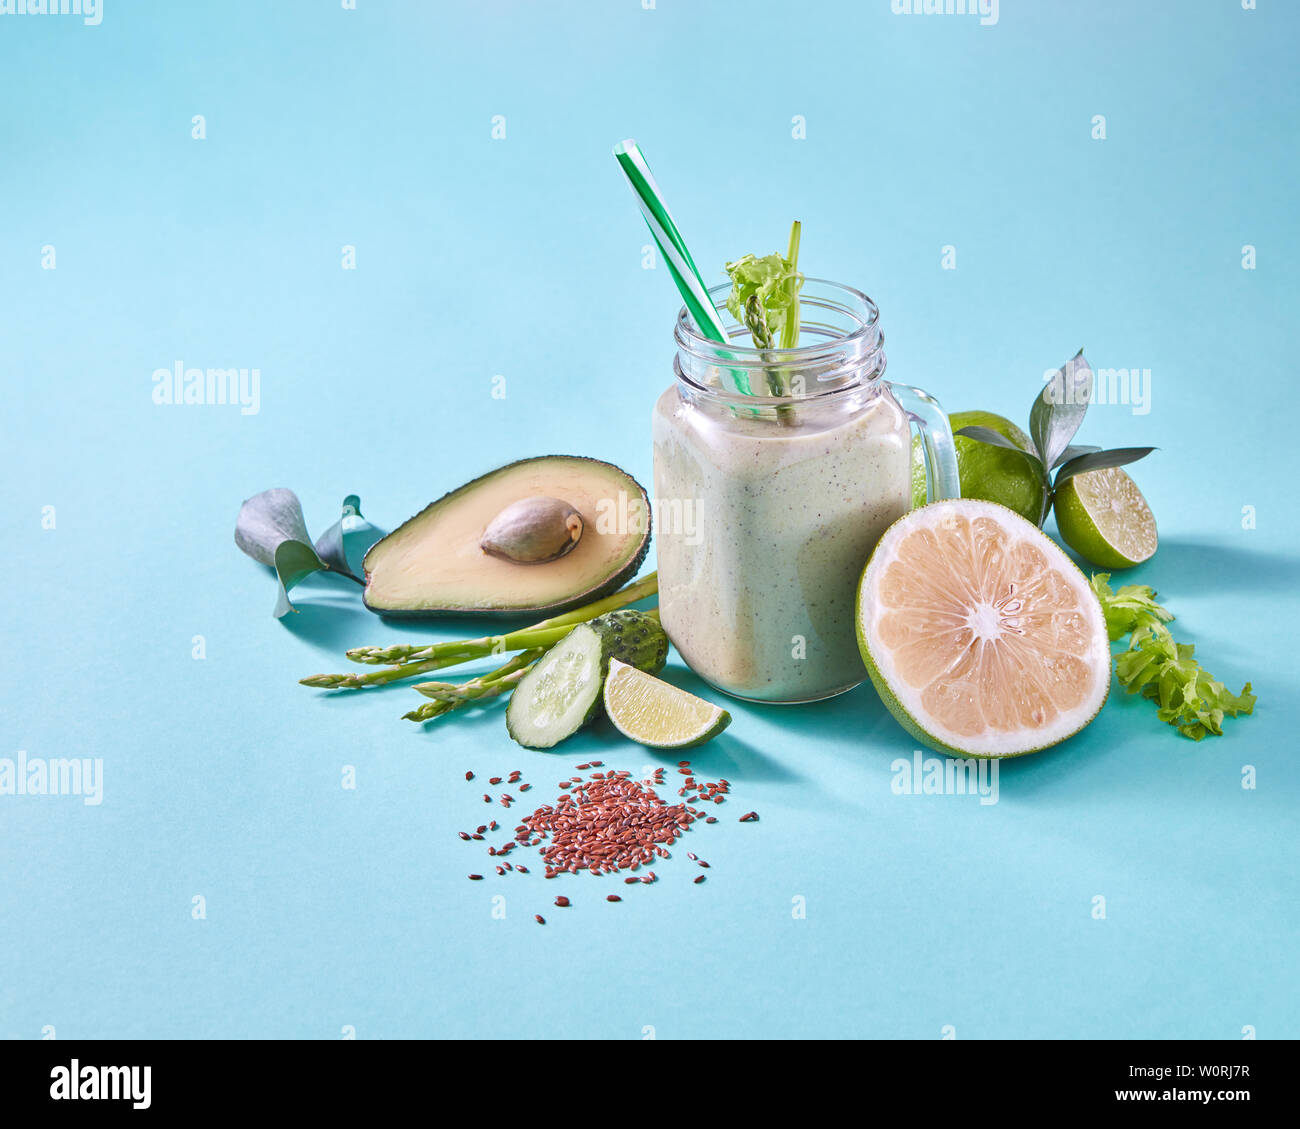 vegetarian,smoothie,clean eating - Stock Image